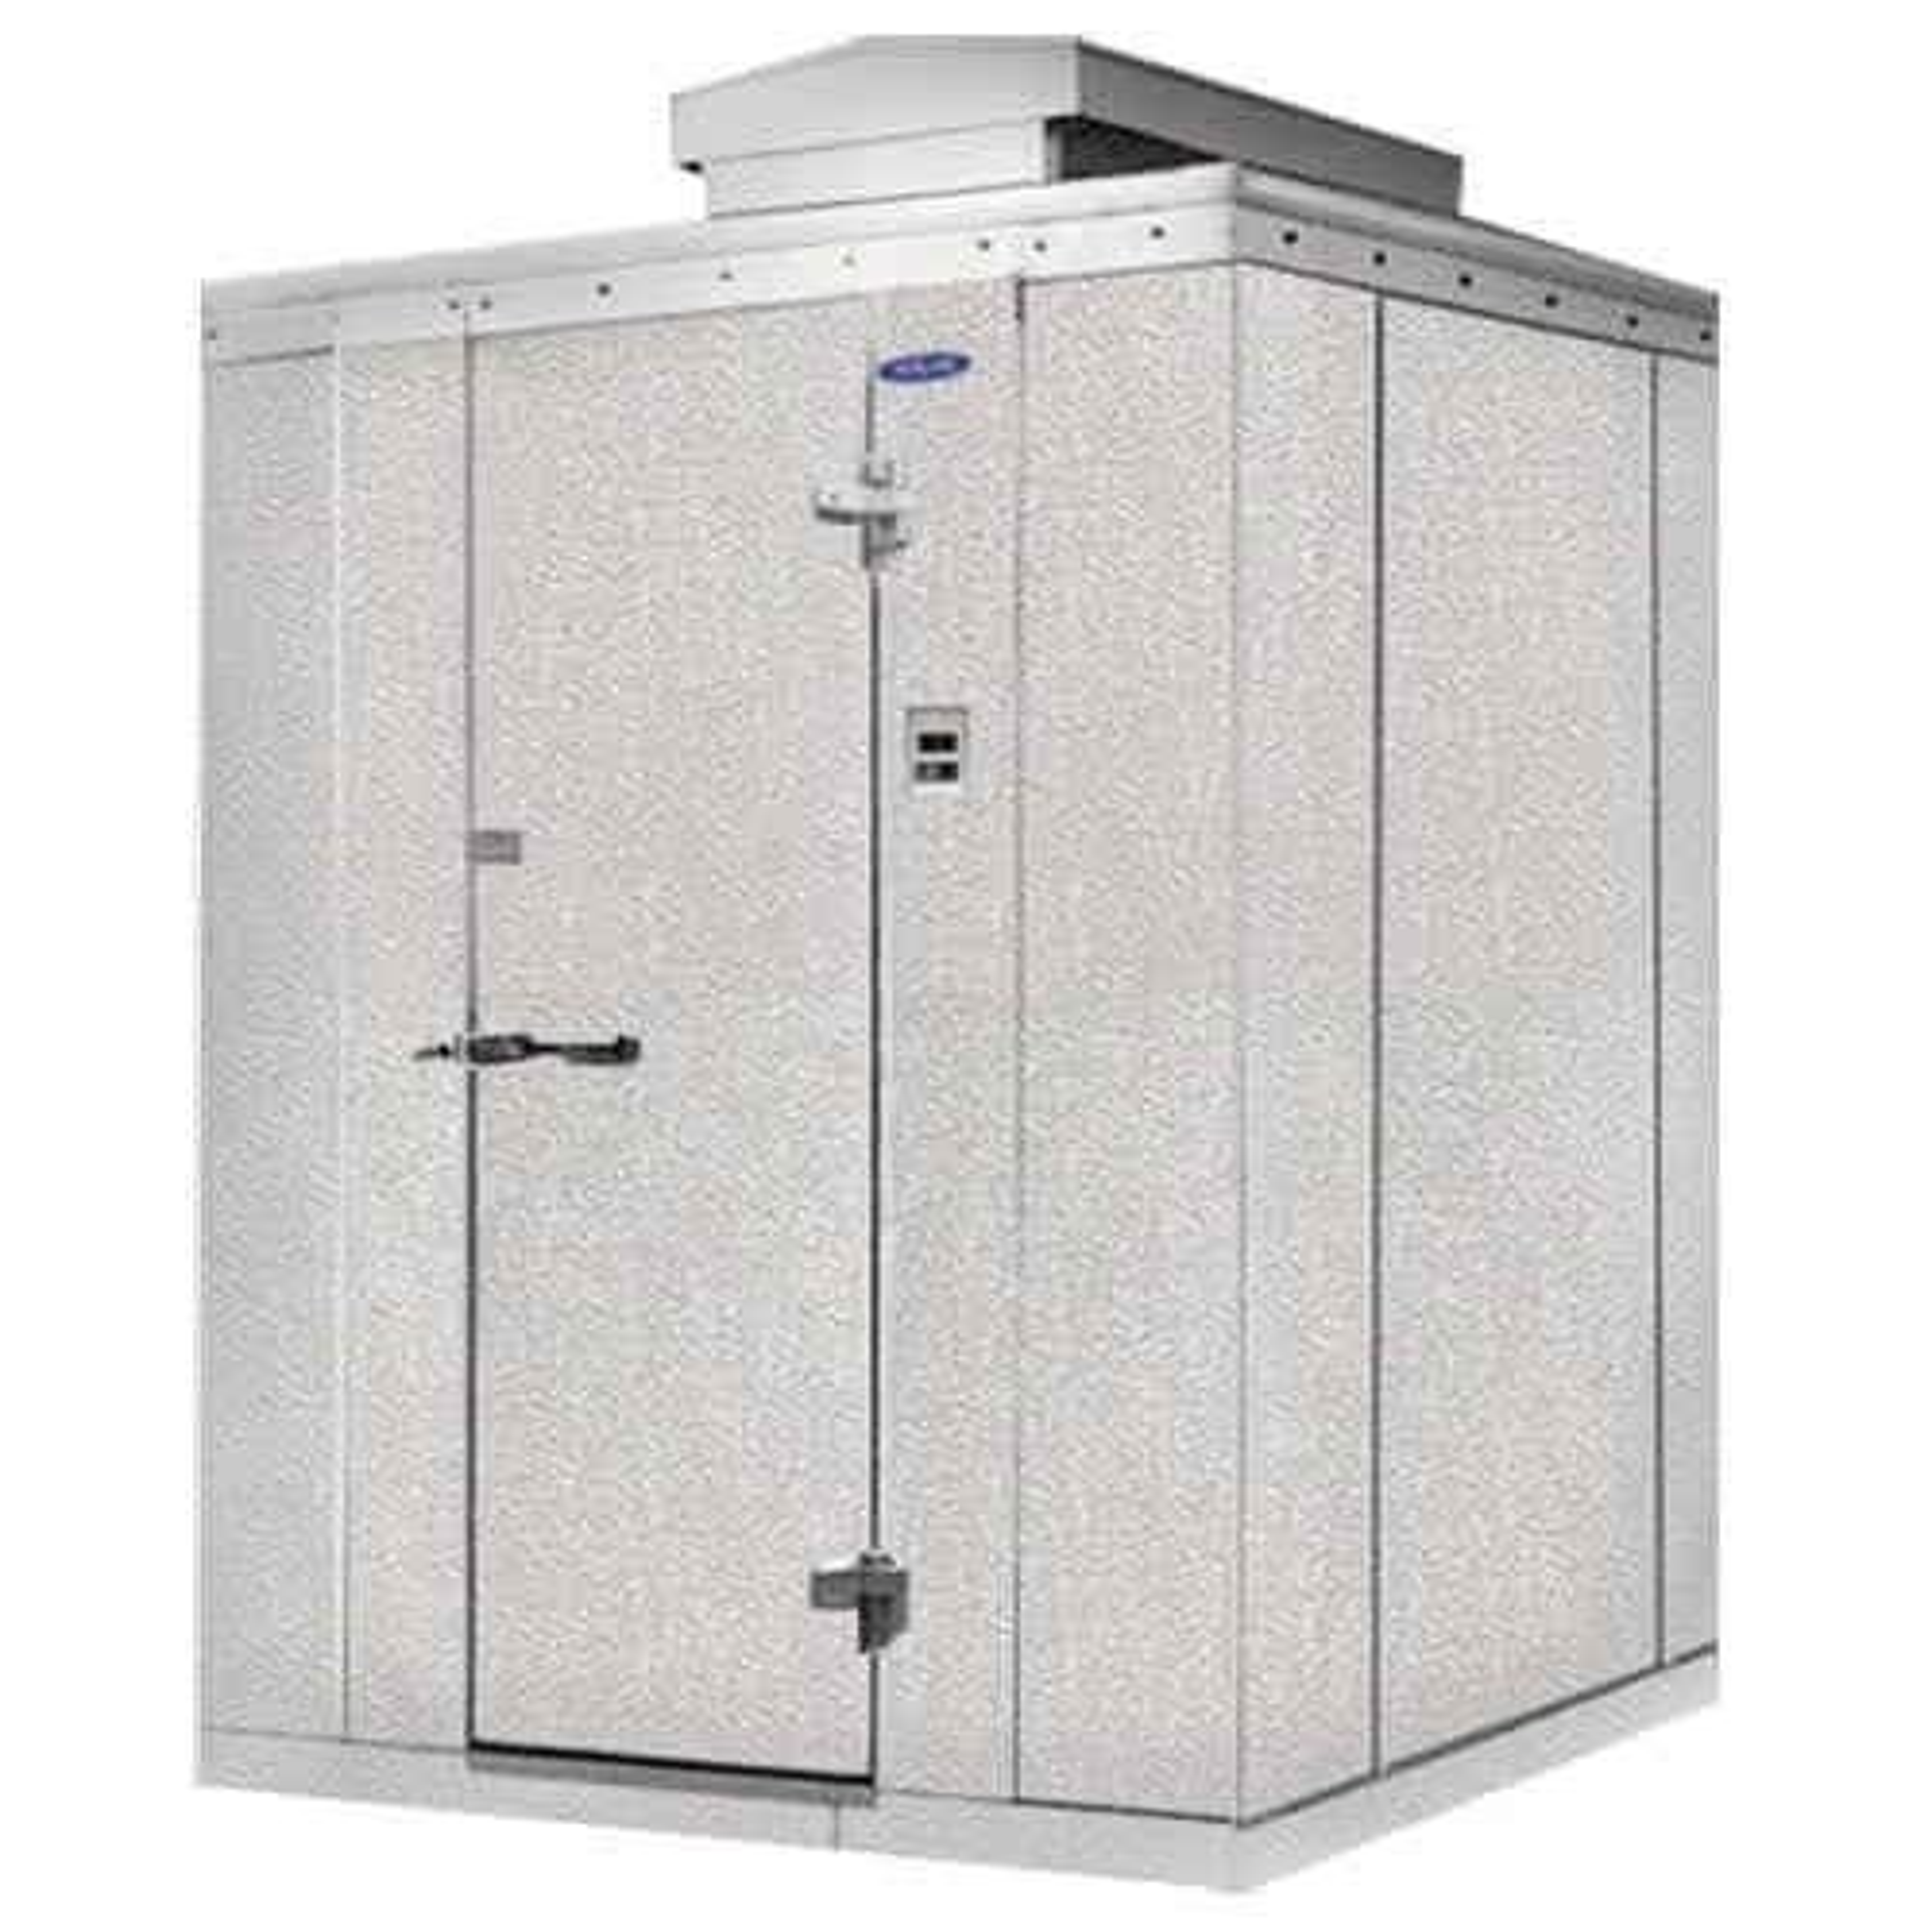 Norlake KODB7766-C Outdoor Walk-In Refrigerator w/ Top Mount Compressor, 6' x 6'